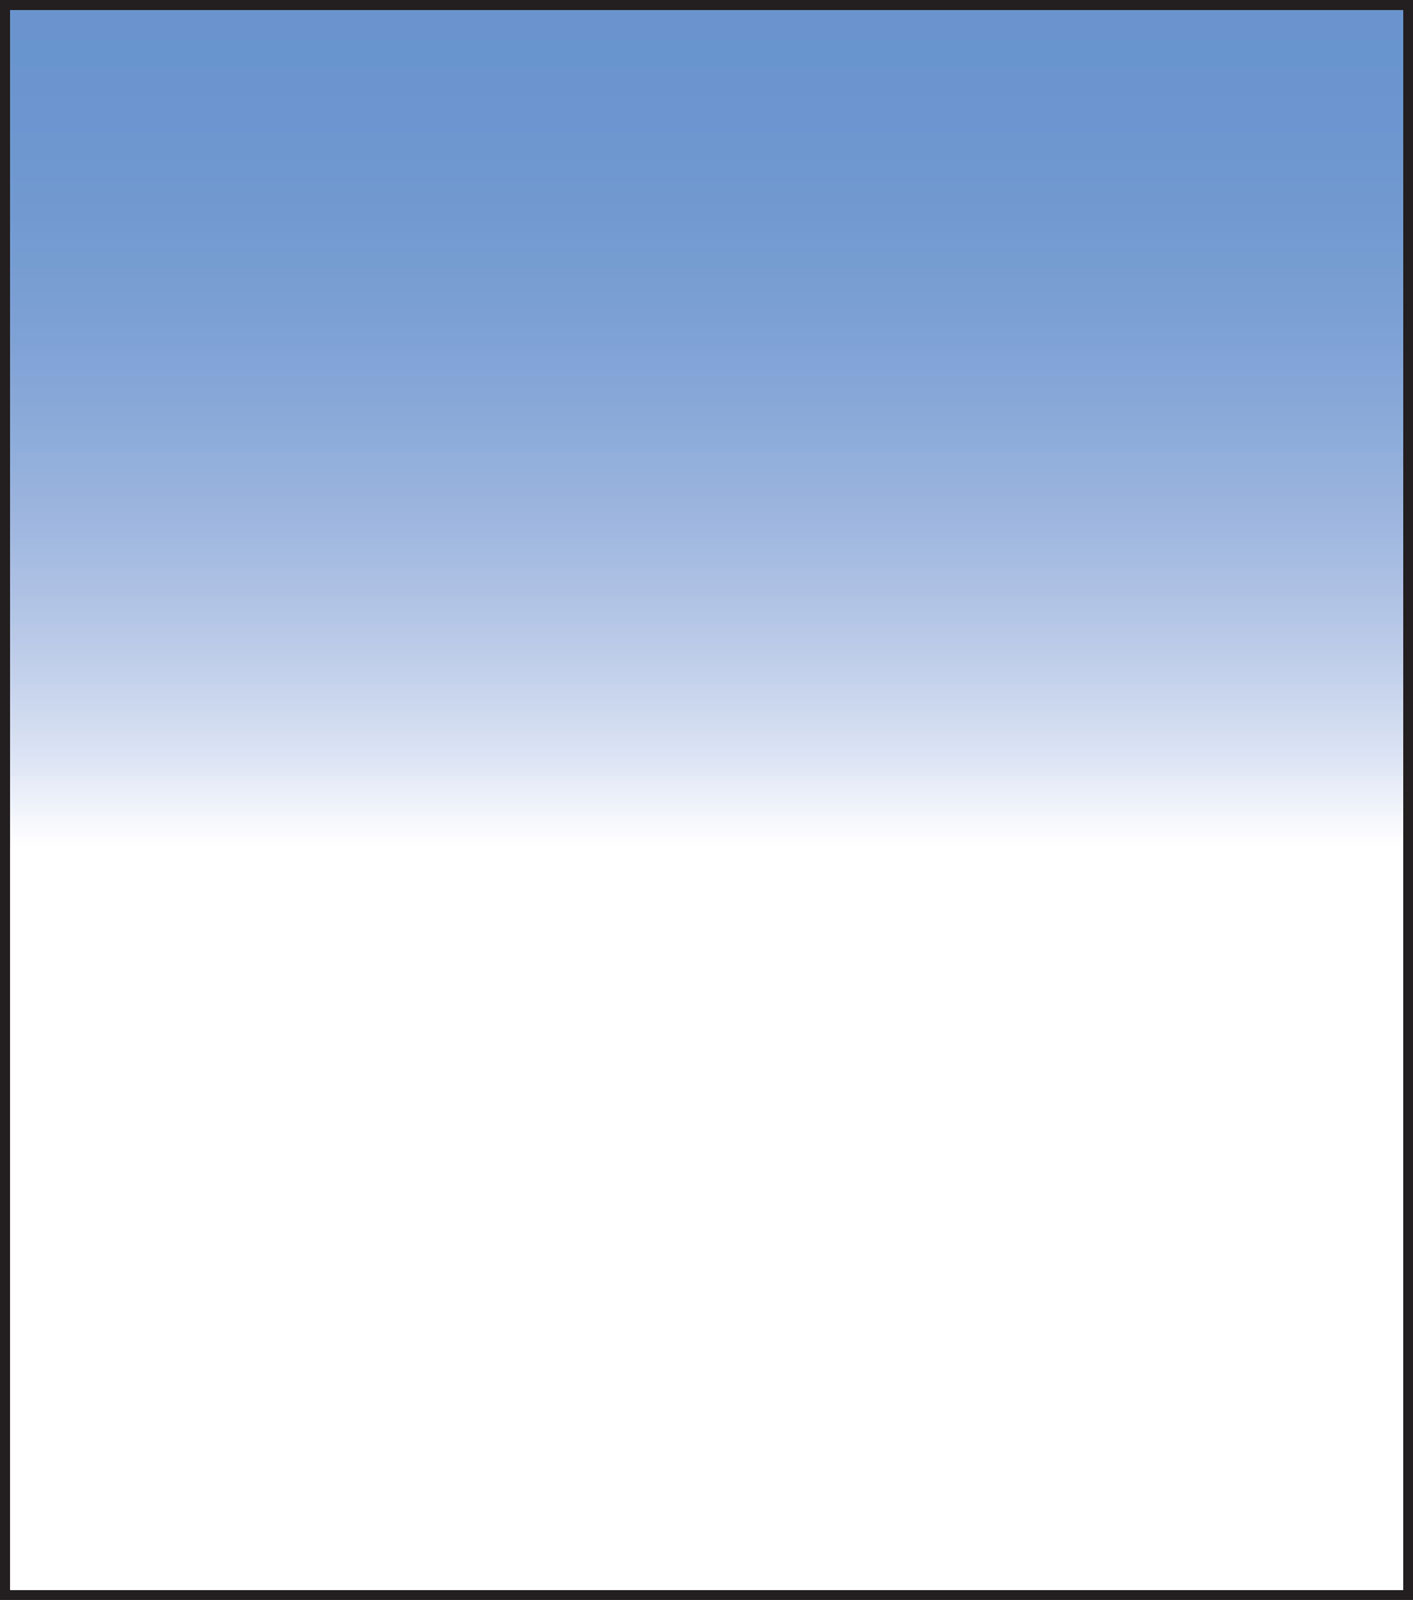 SW150-Sky-Blue-3-Hard-Grad